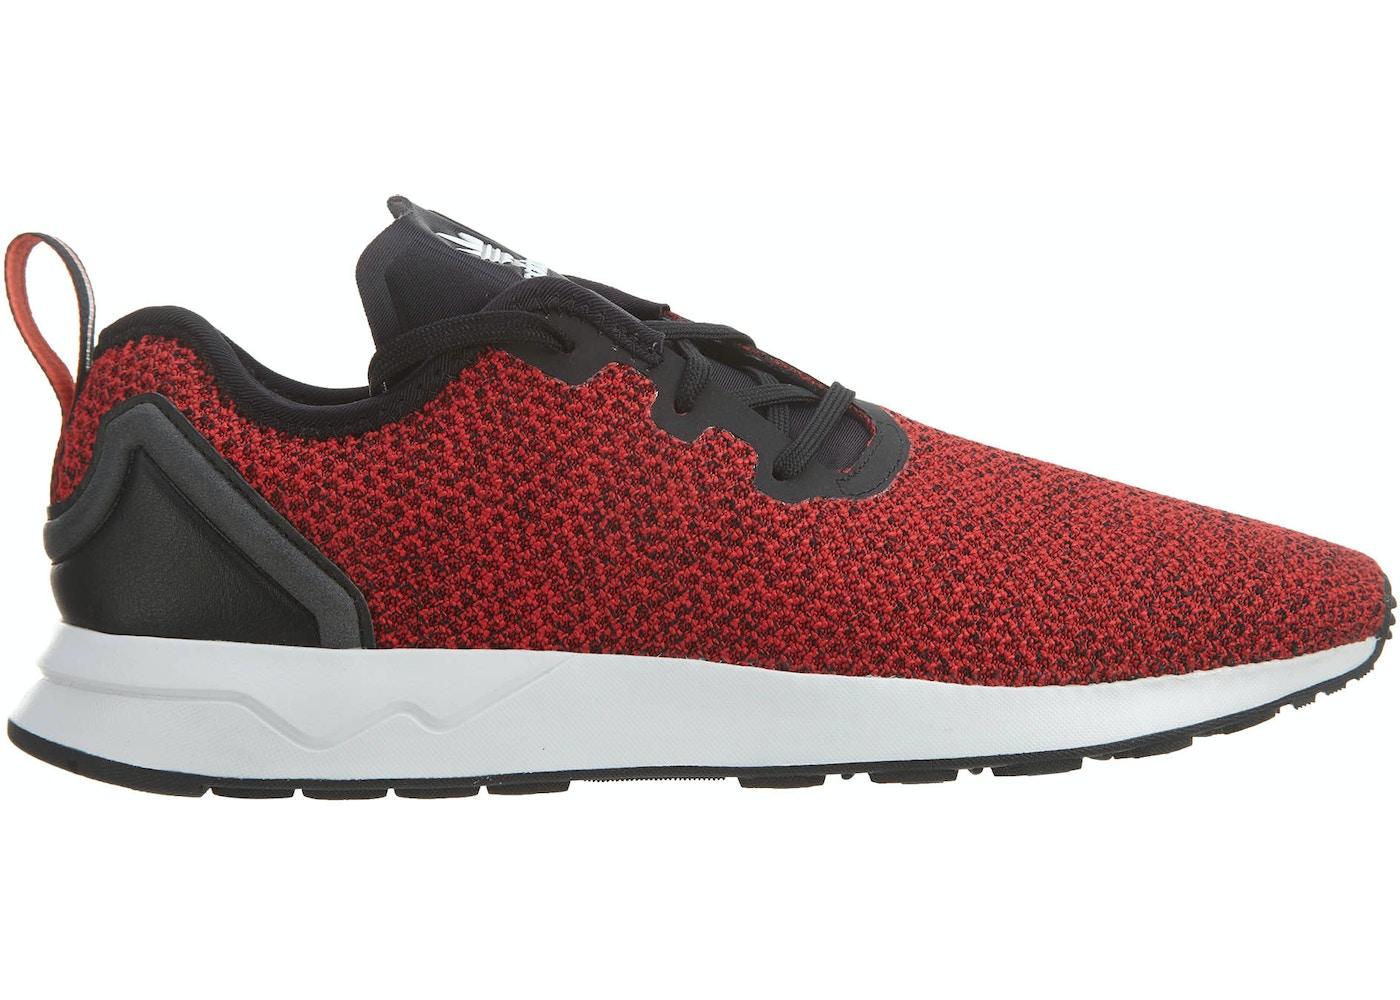 promo code 120a0 86e87 adidas Zx Flux Adv Asym Red/Ftwwhite/Cblack